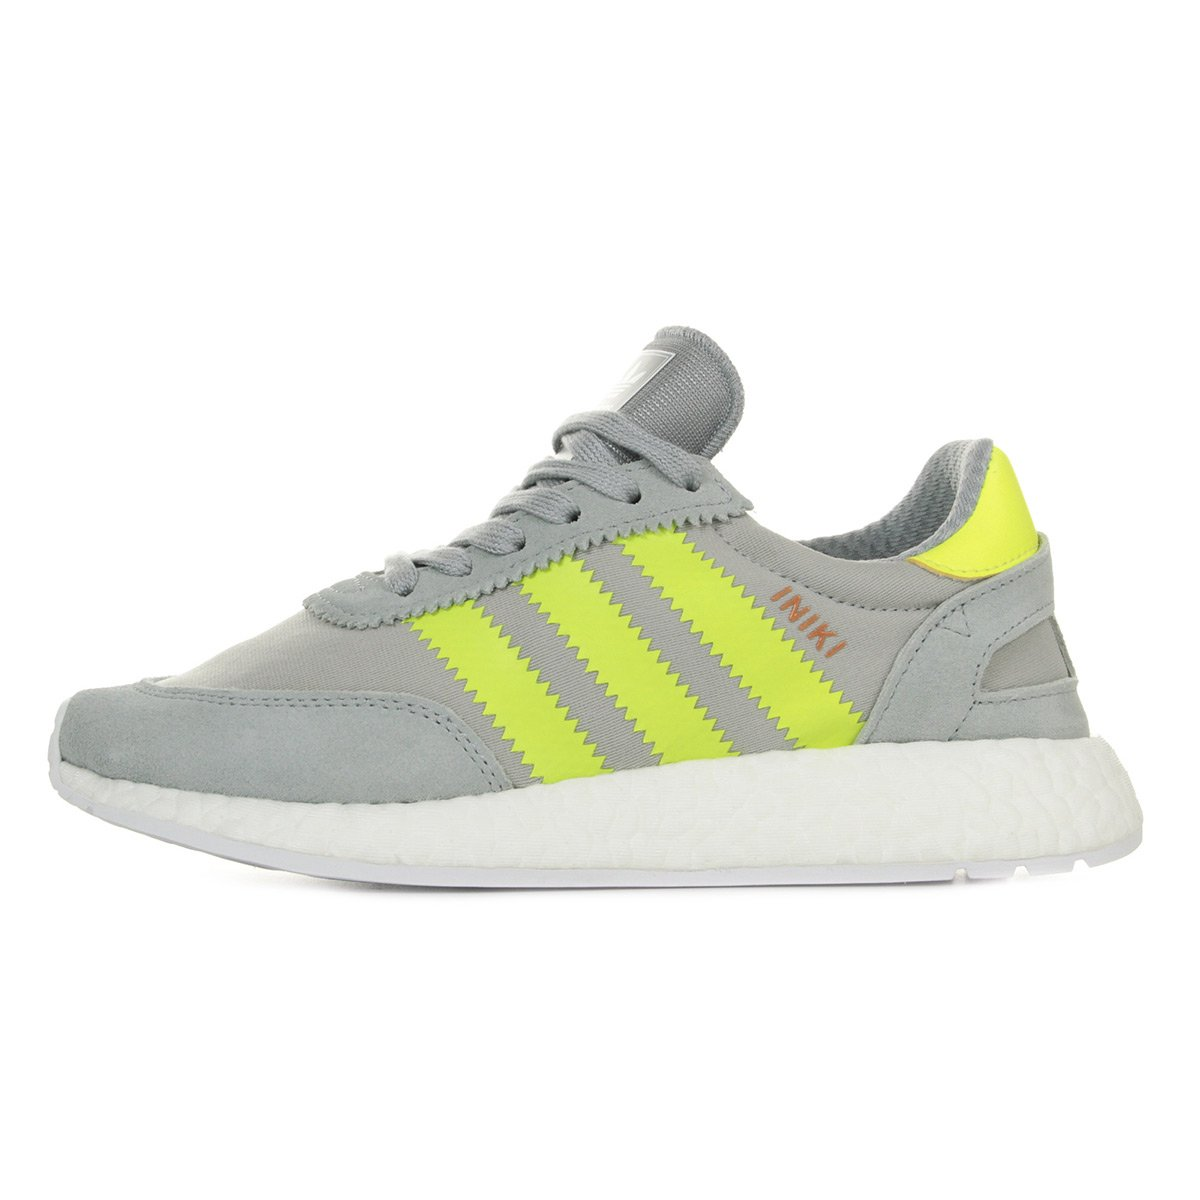 adidas Iniki Runner Damen Schuhe Turnschuhe Sneaker BB0001 Neu OVP EU 40  2 3 Grau - associate-degree.de 6da6c02735